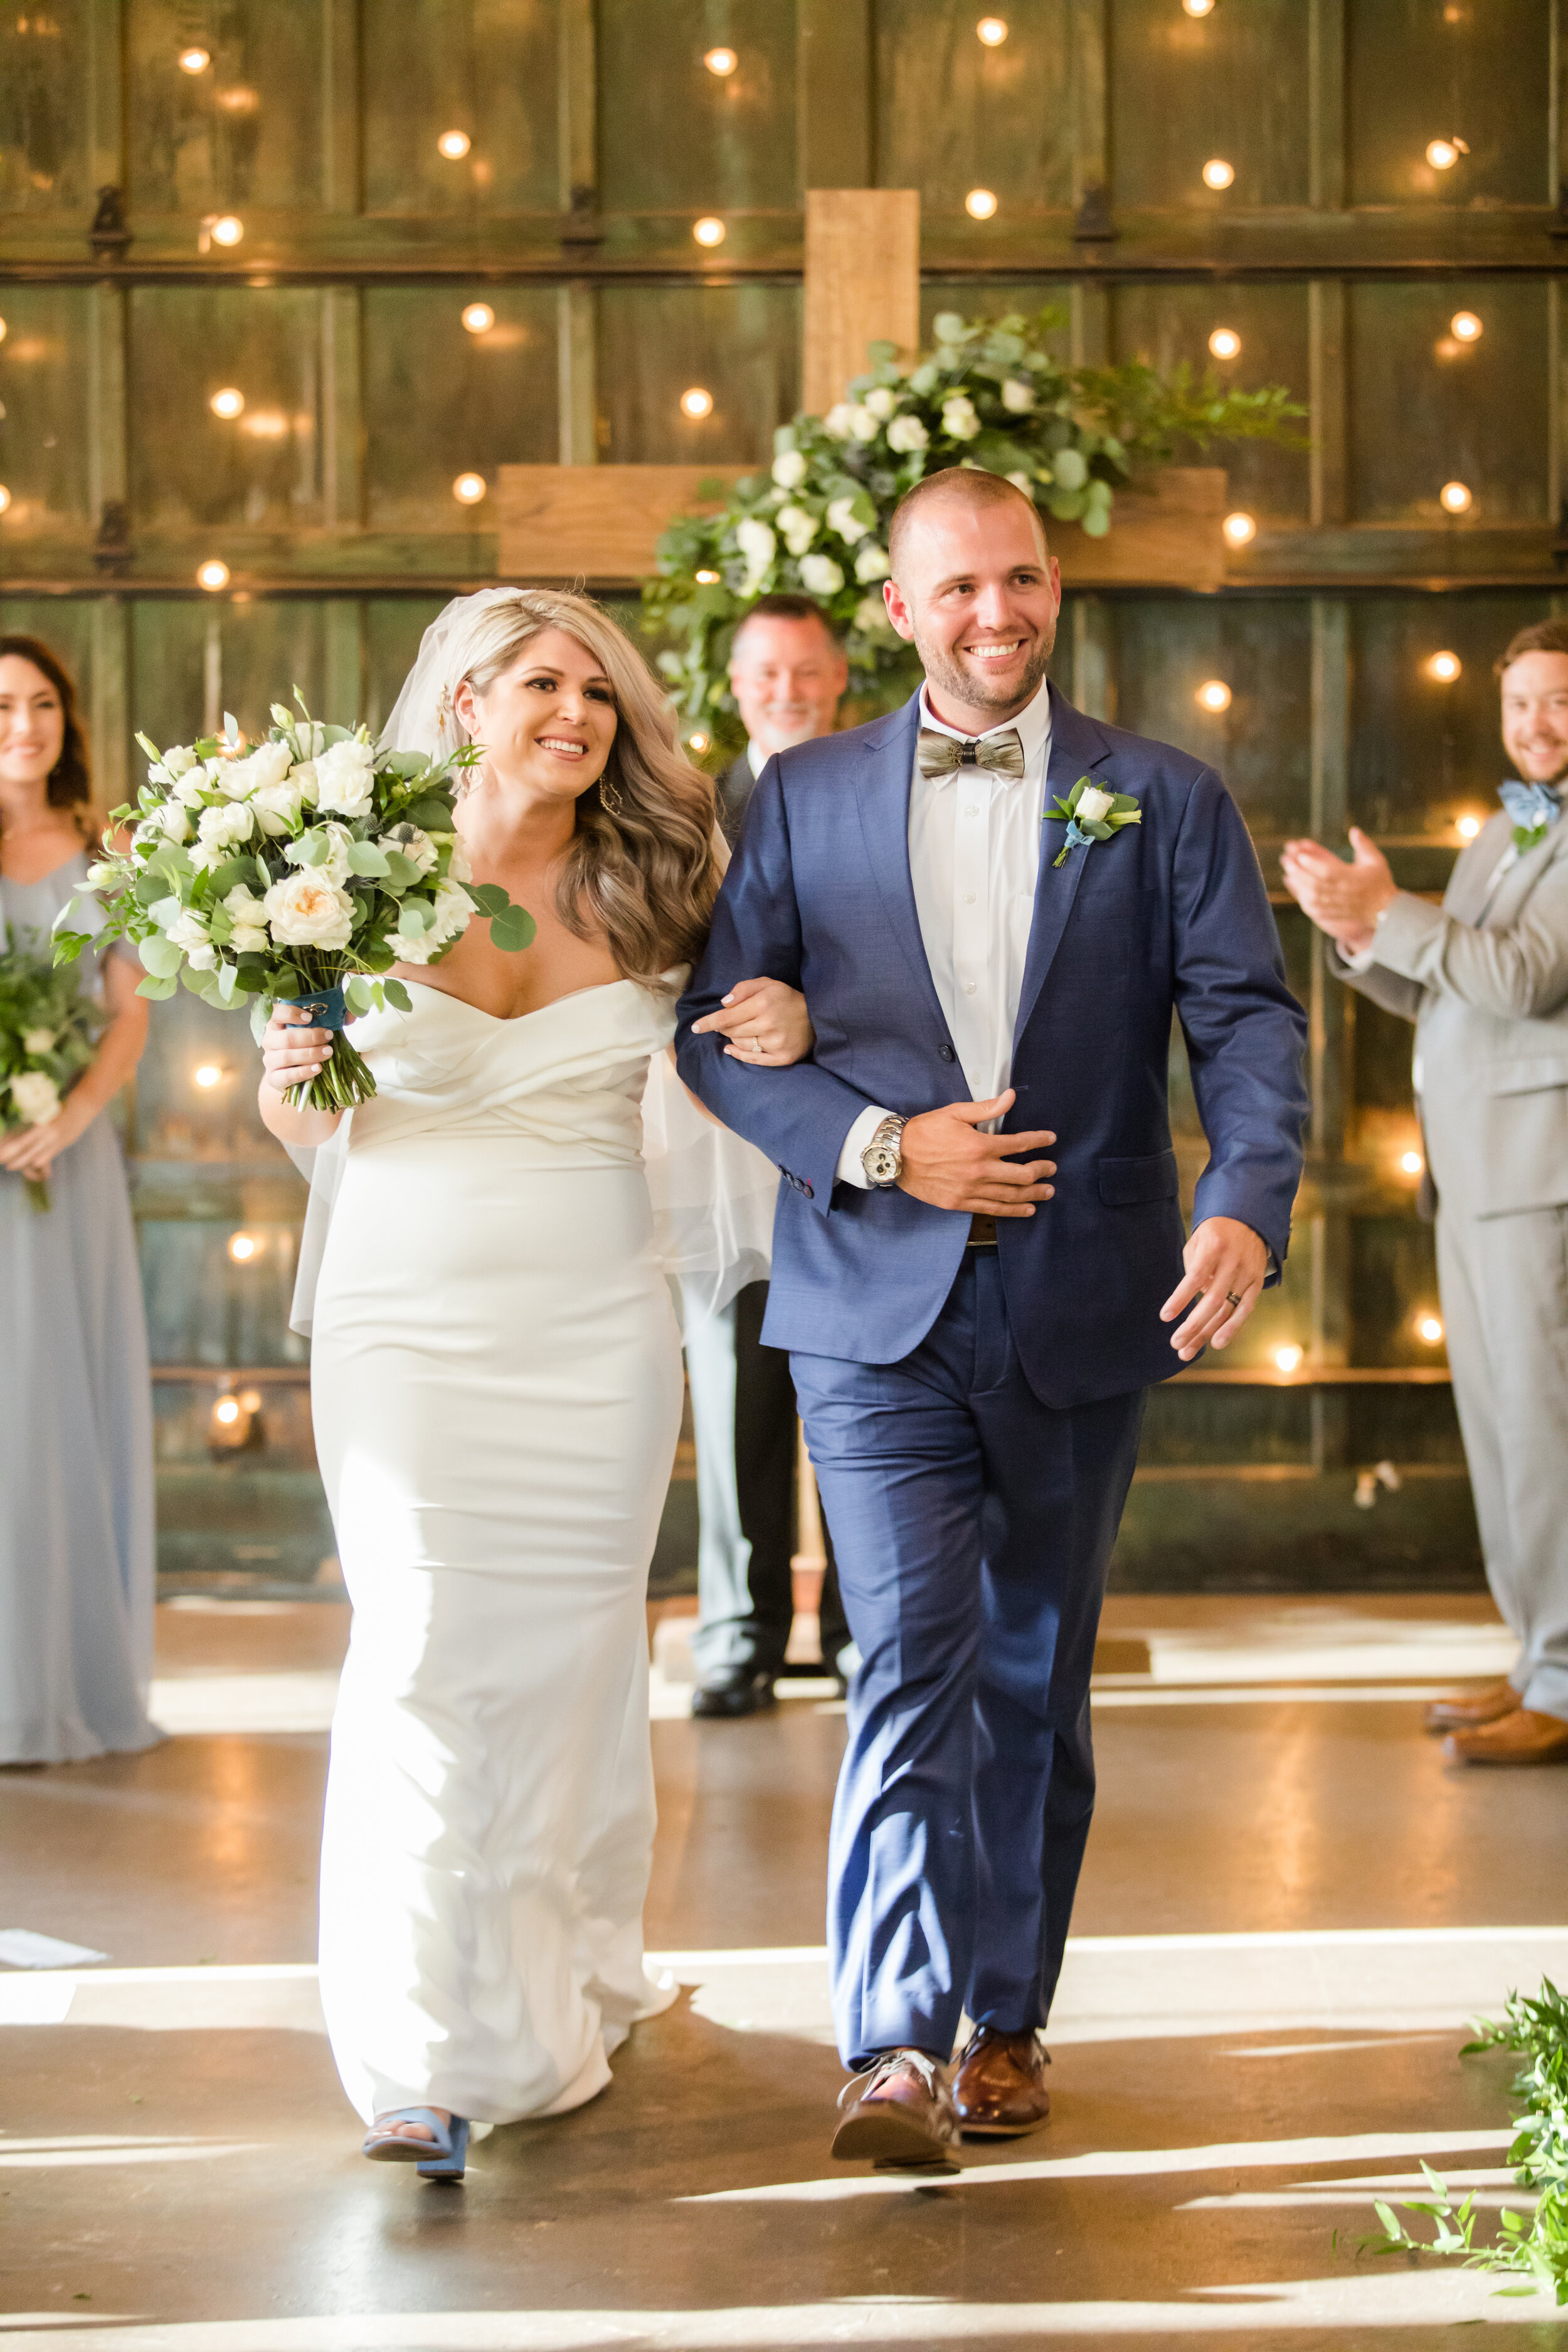 ivory-and-beau-bride-wedding-dresses-bridal-boutique-bridal-shop-savannah-wedding-shop-DGP_SohoSouthCafe_Swanagin-Mullis-380.JPG